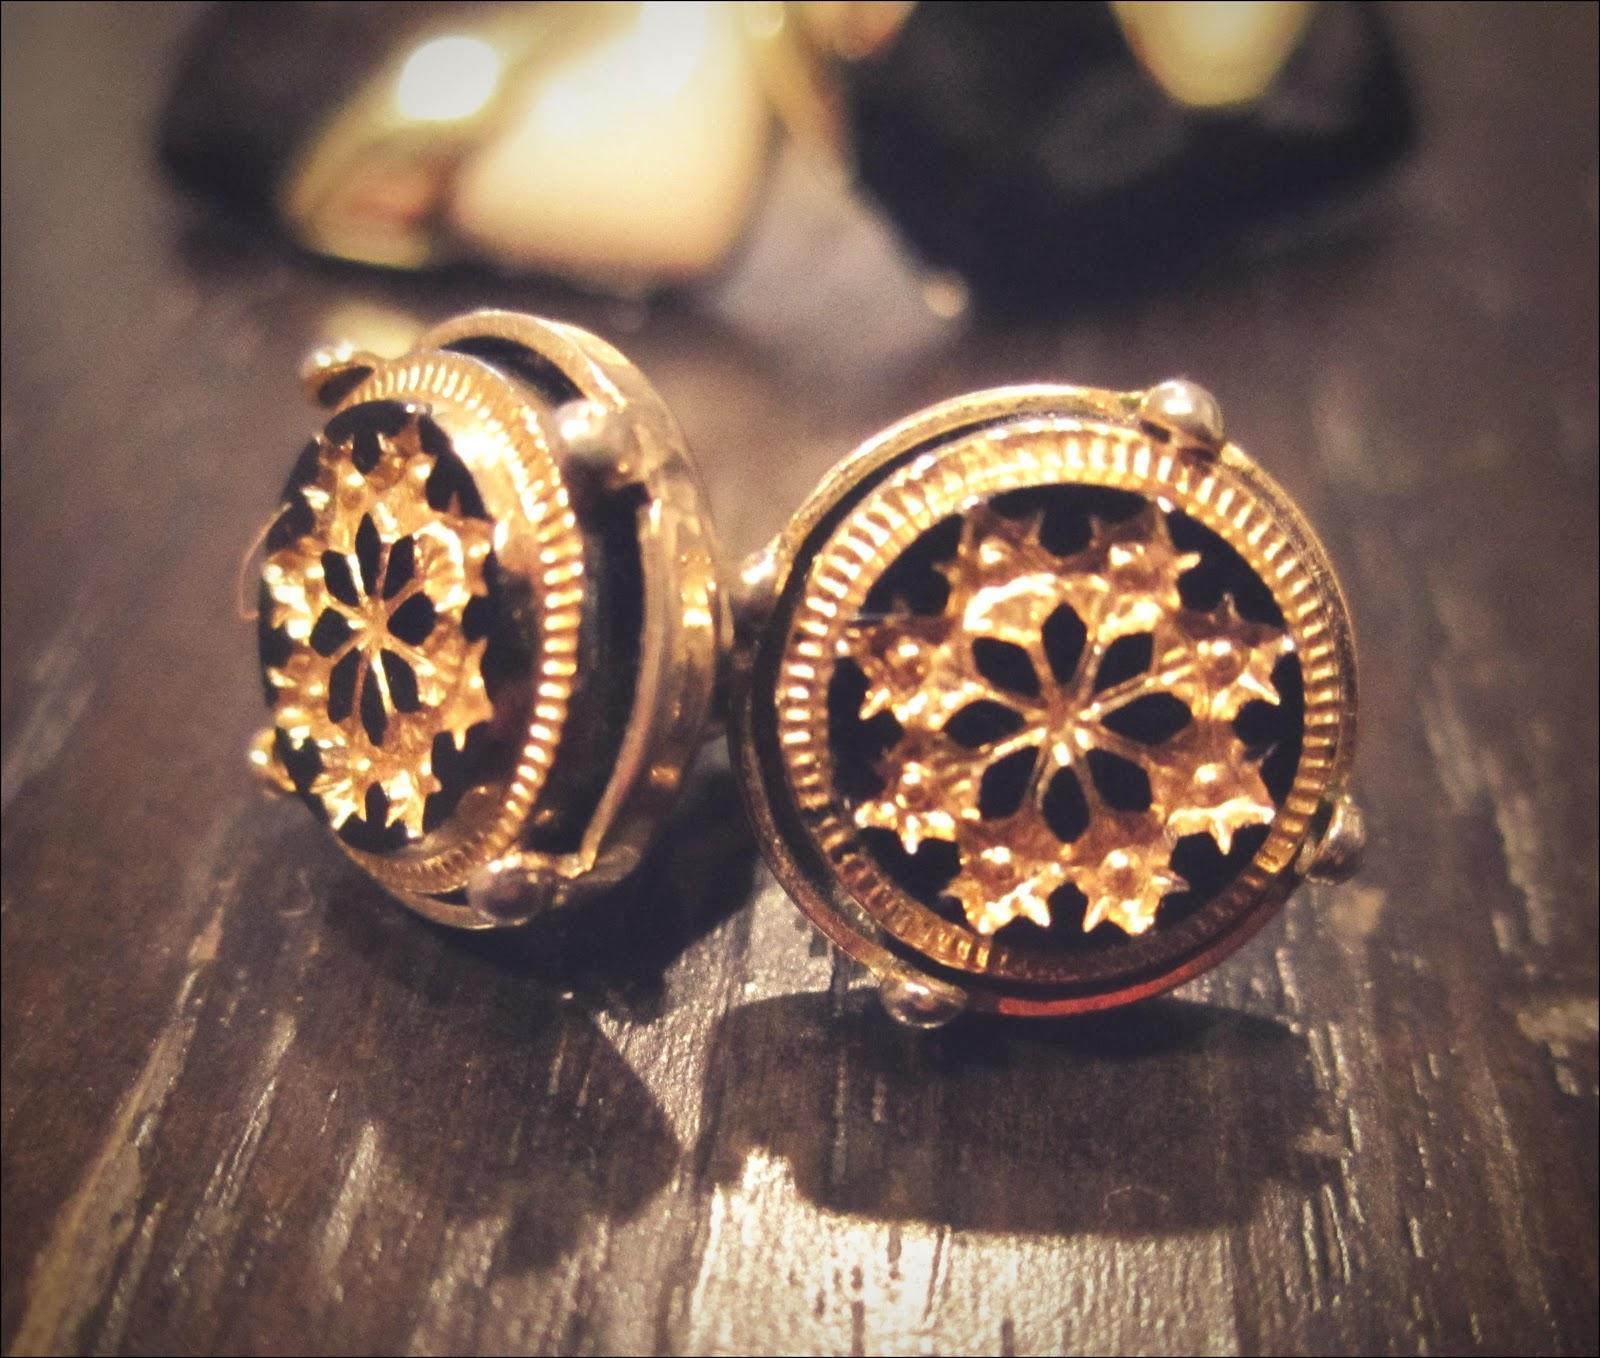 hocuskocis thrifted gold jewelry